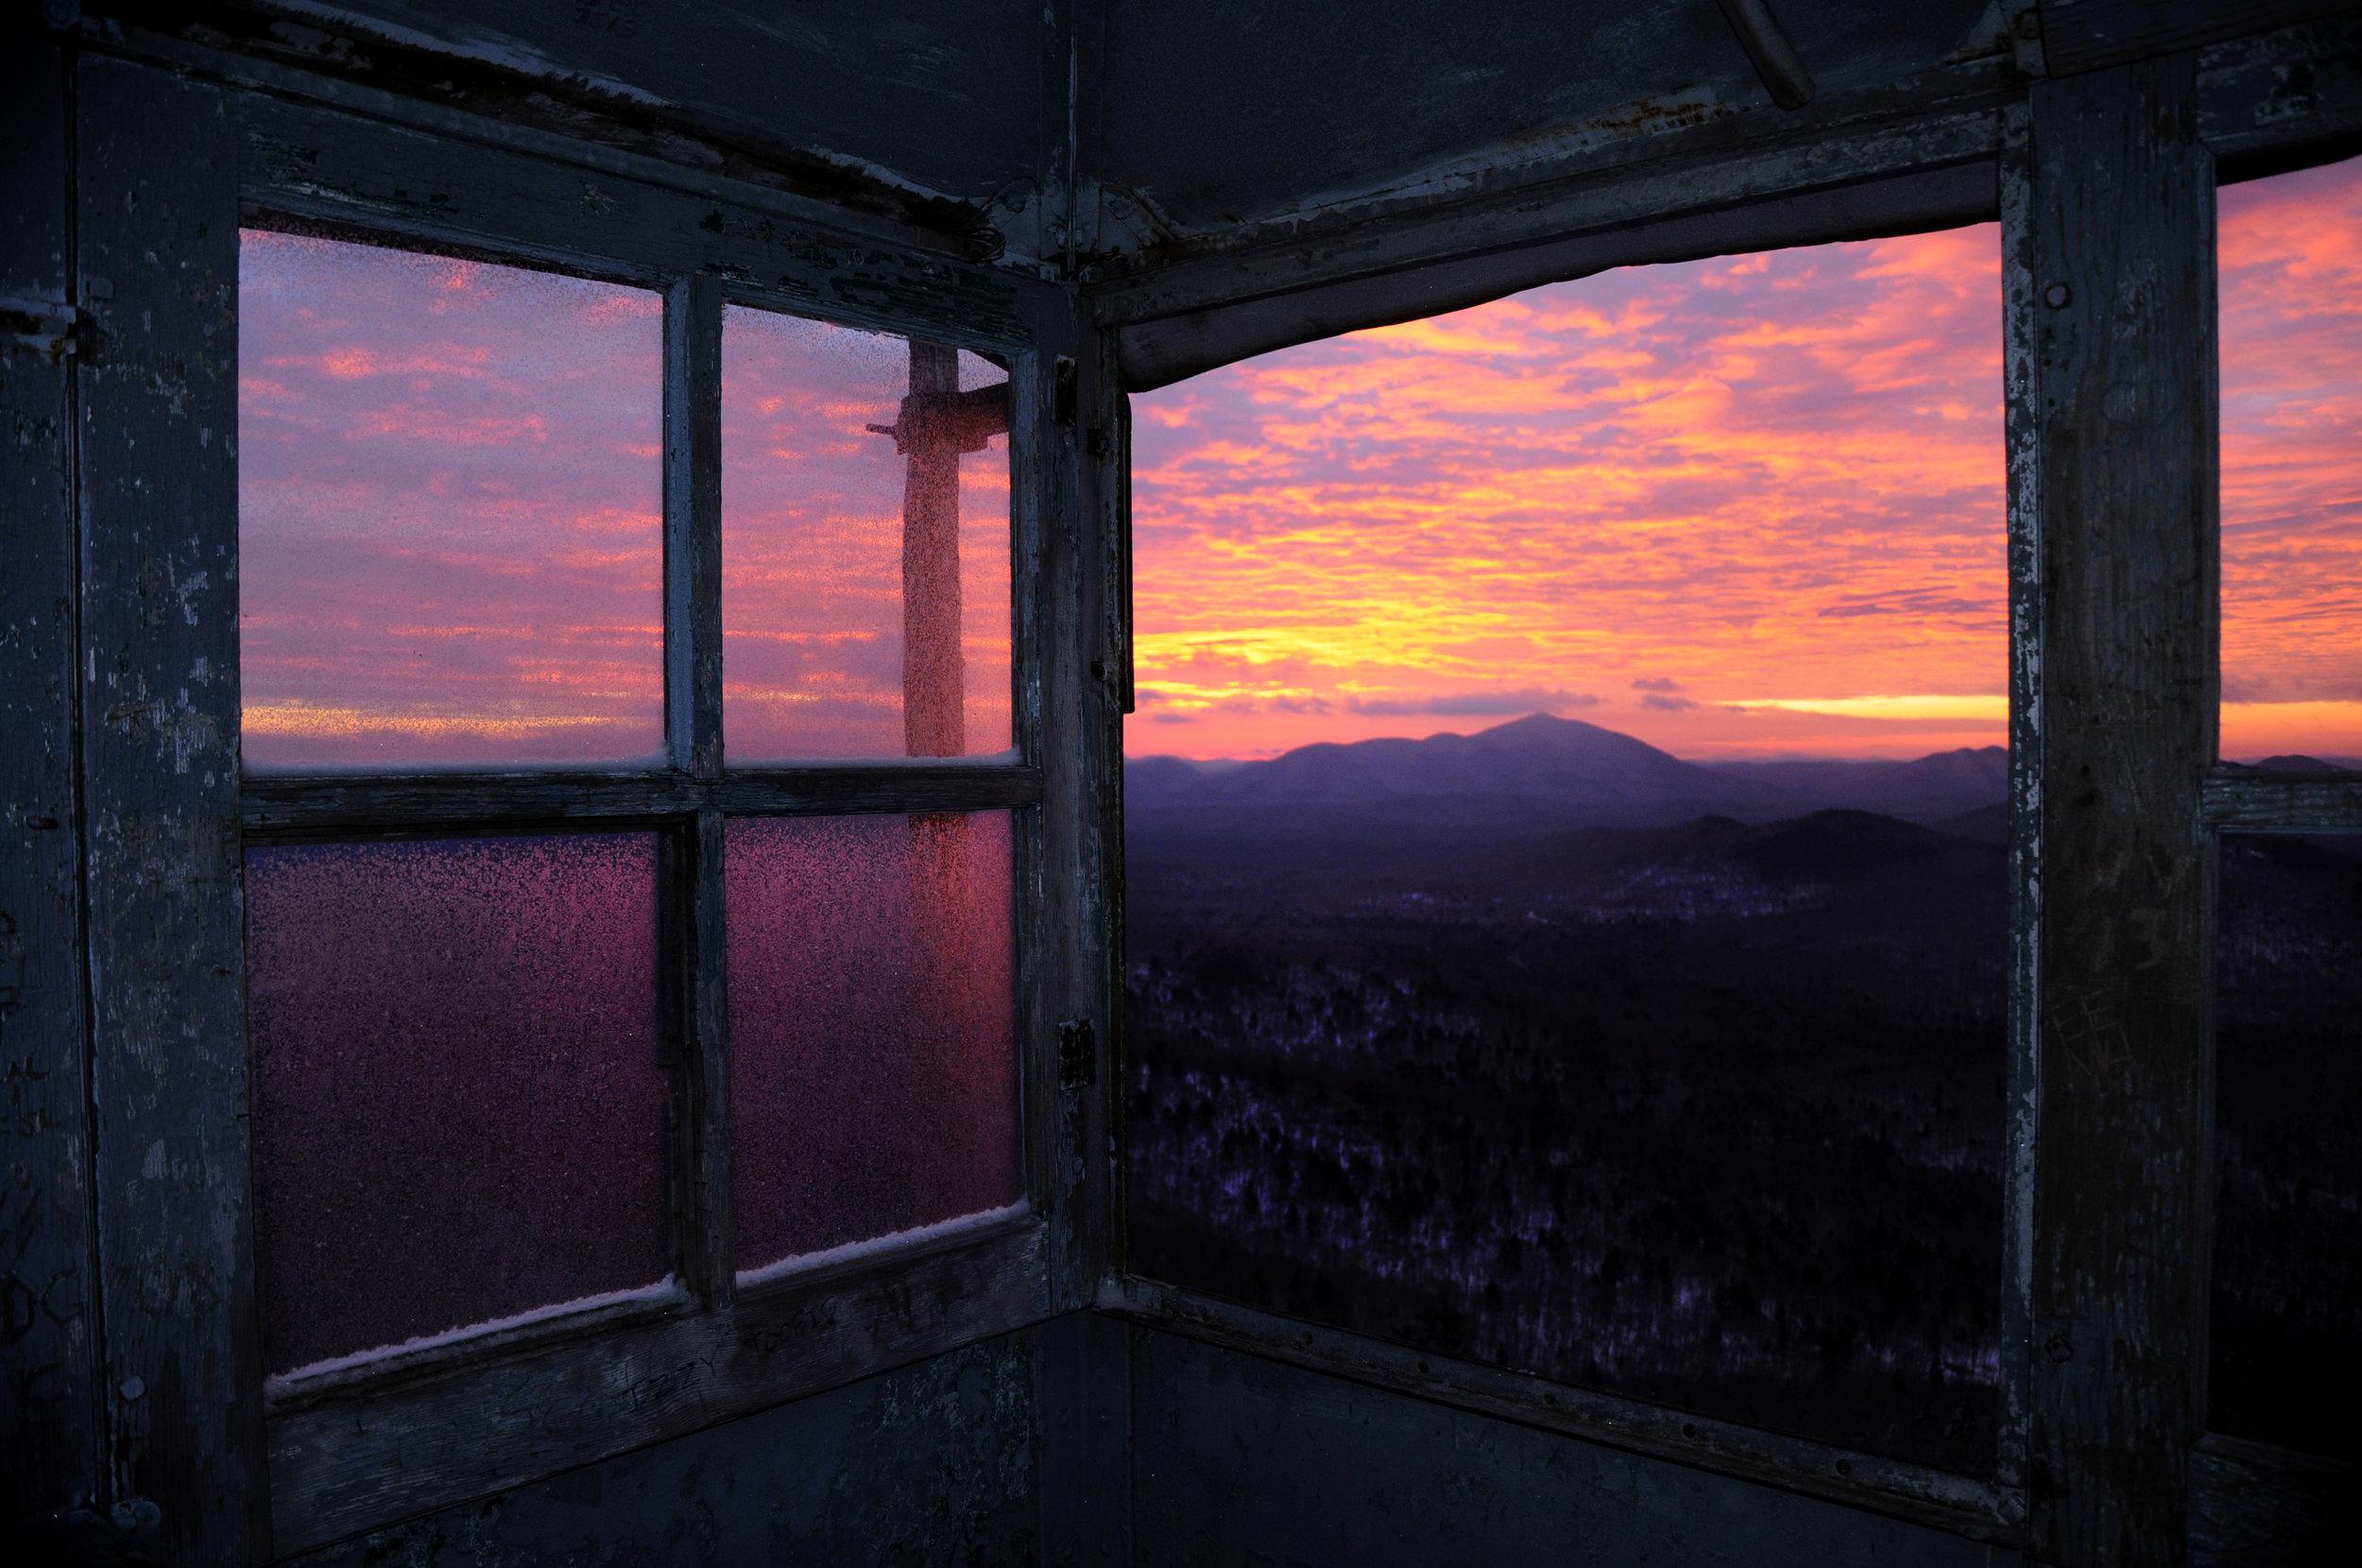 Open Edition #10 — Fire Tower Sunset - 12x18 - $45